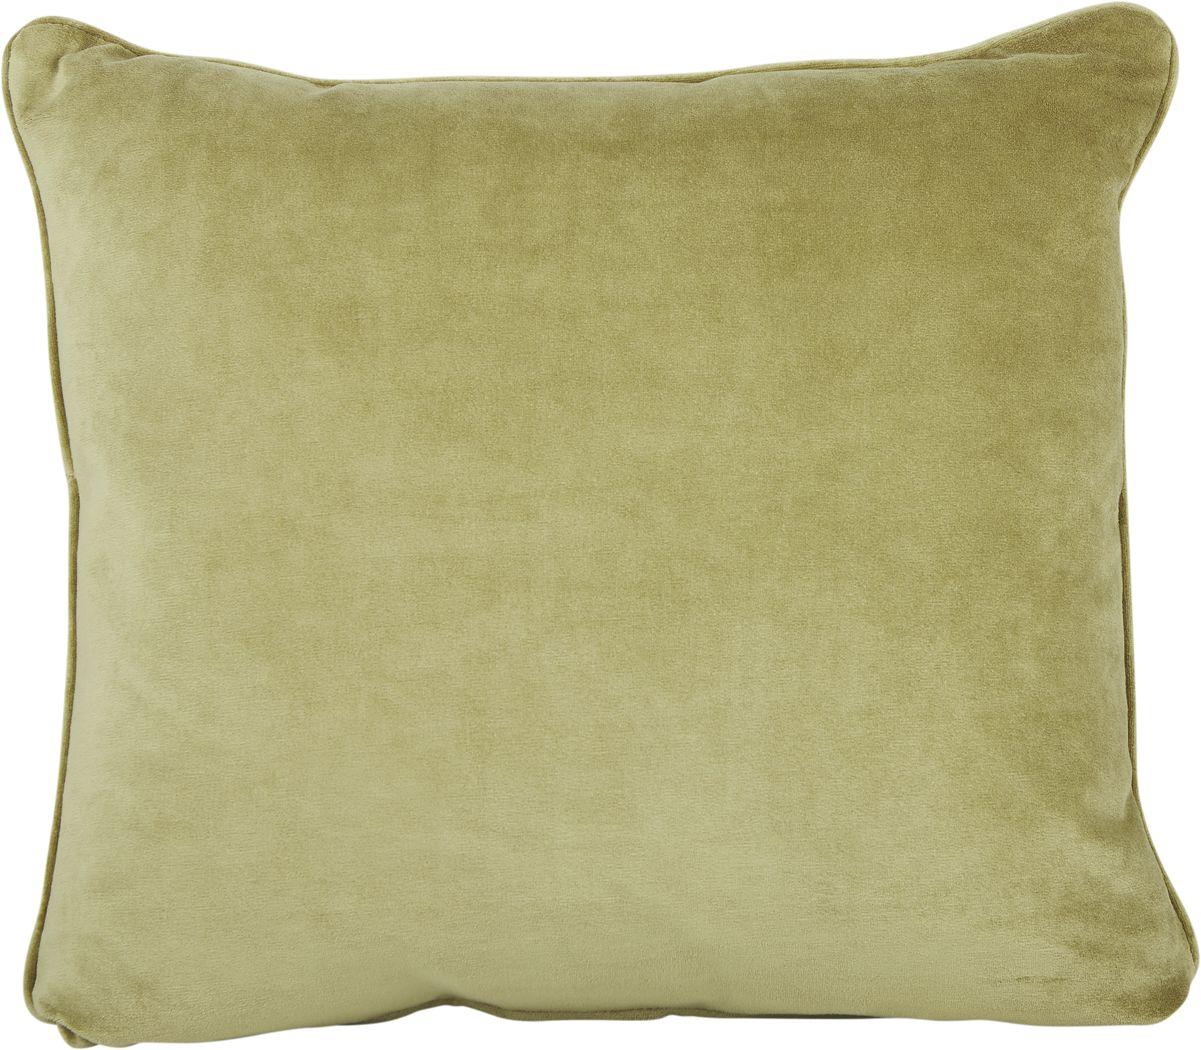 iSofa Romo Olive Accent Pillow